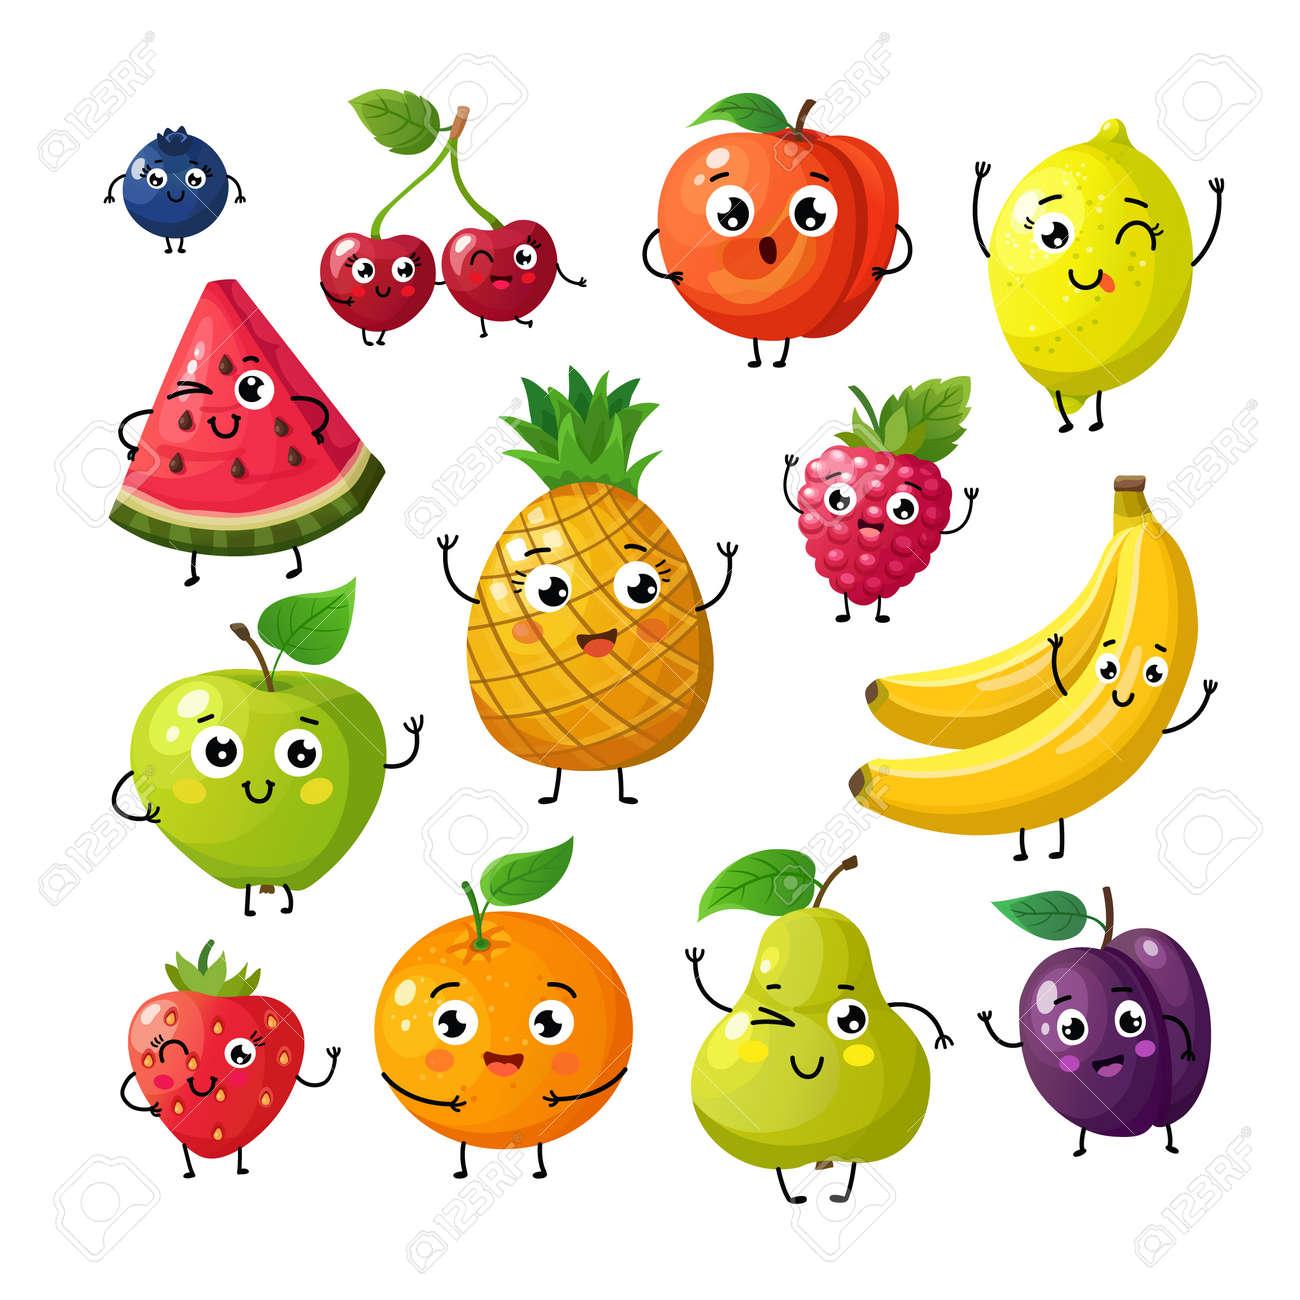 Cartoon funny fruits. Happy kiwi banana raspberry orange cherry with face. Summer fruit and berry vector characters isolated on white. Fruit kiwi and banana, orange and strawberry illustration - 168059352